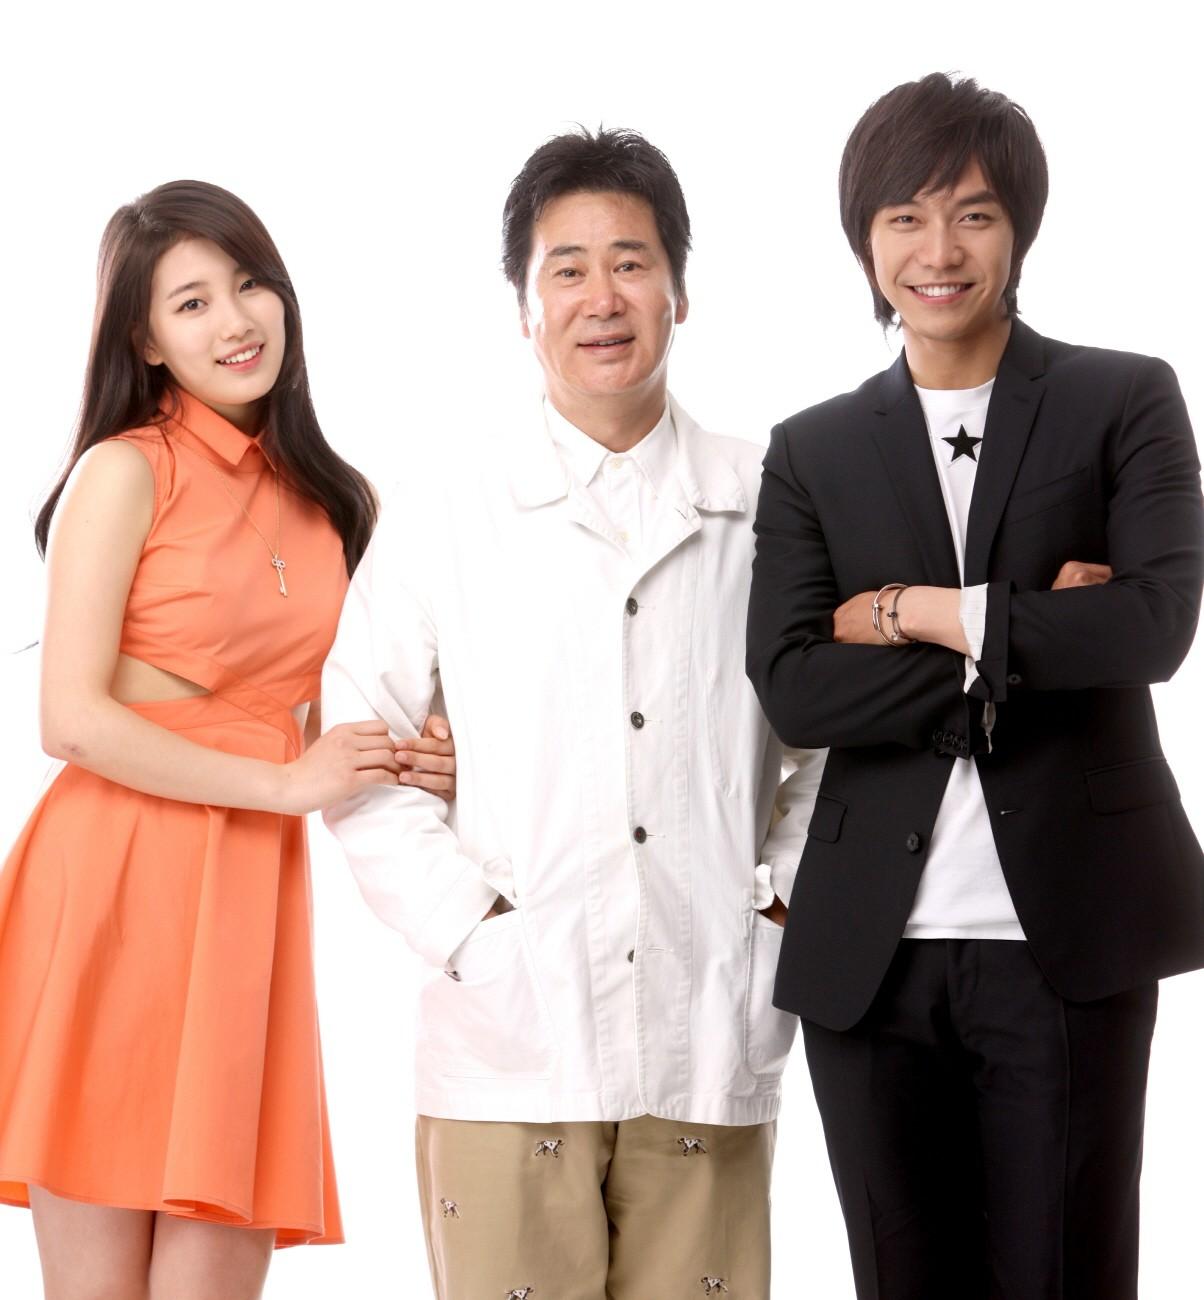 lee seung gi and suzy - photo #29